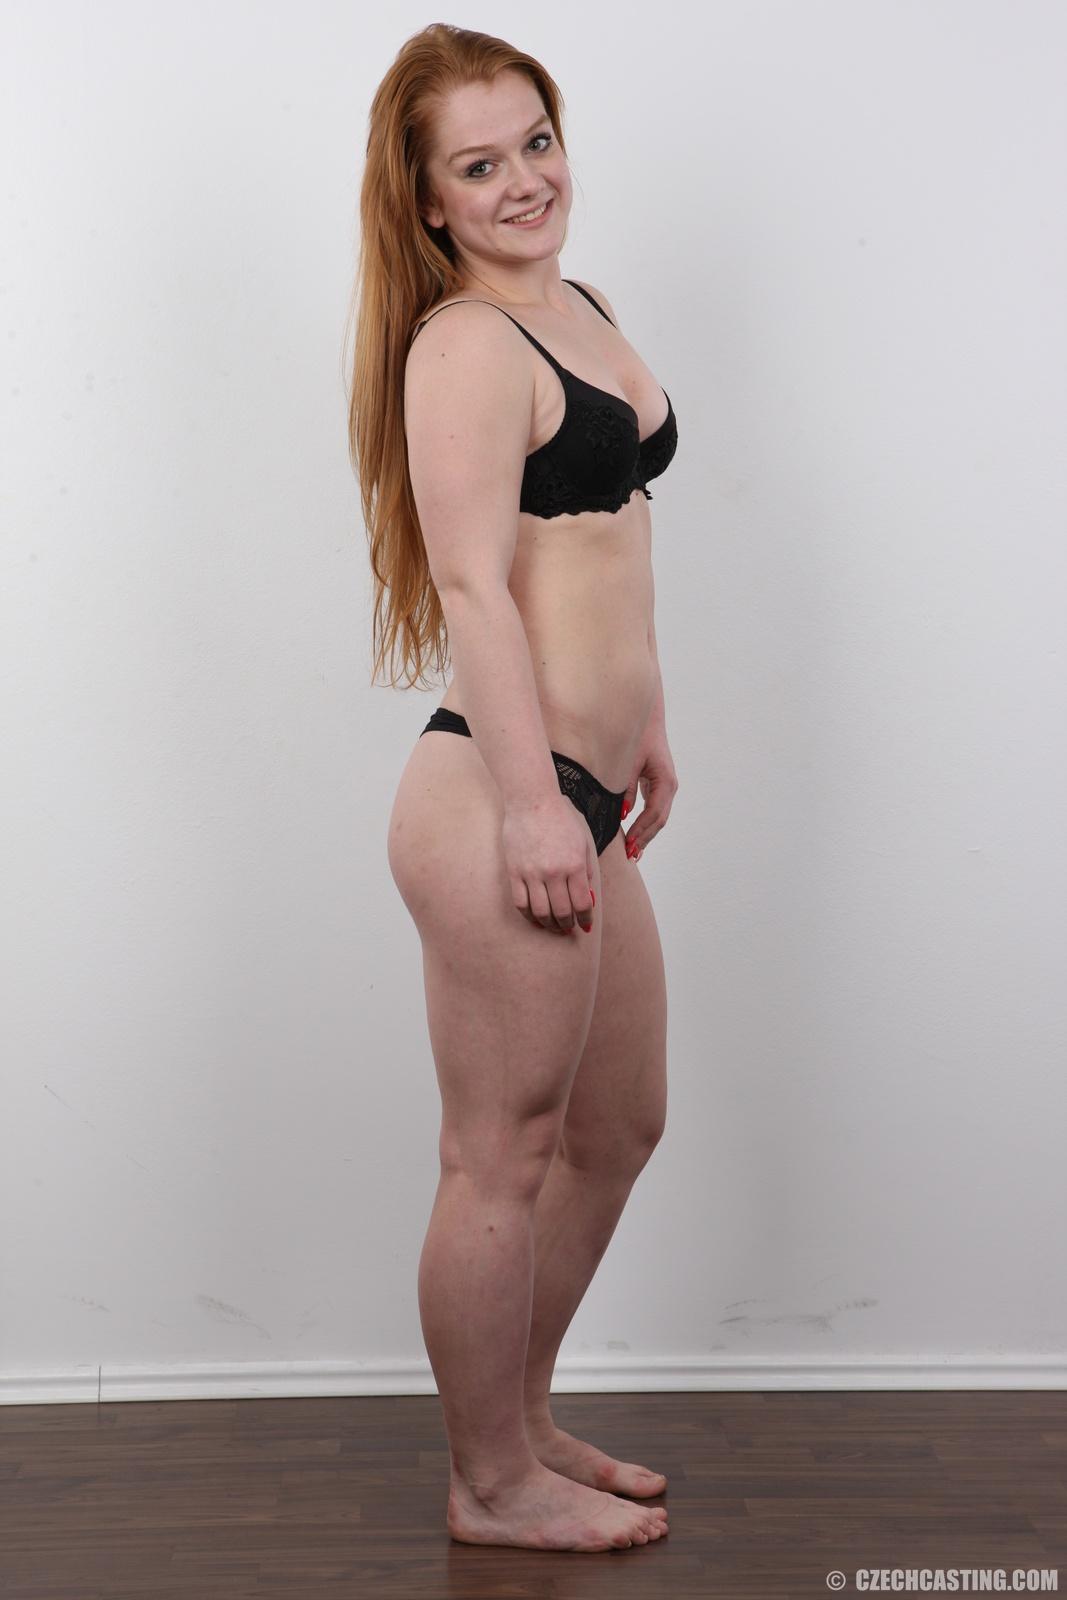 wpid-18-year-old-eliska-casting-photos14.jpg